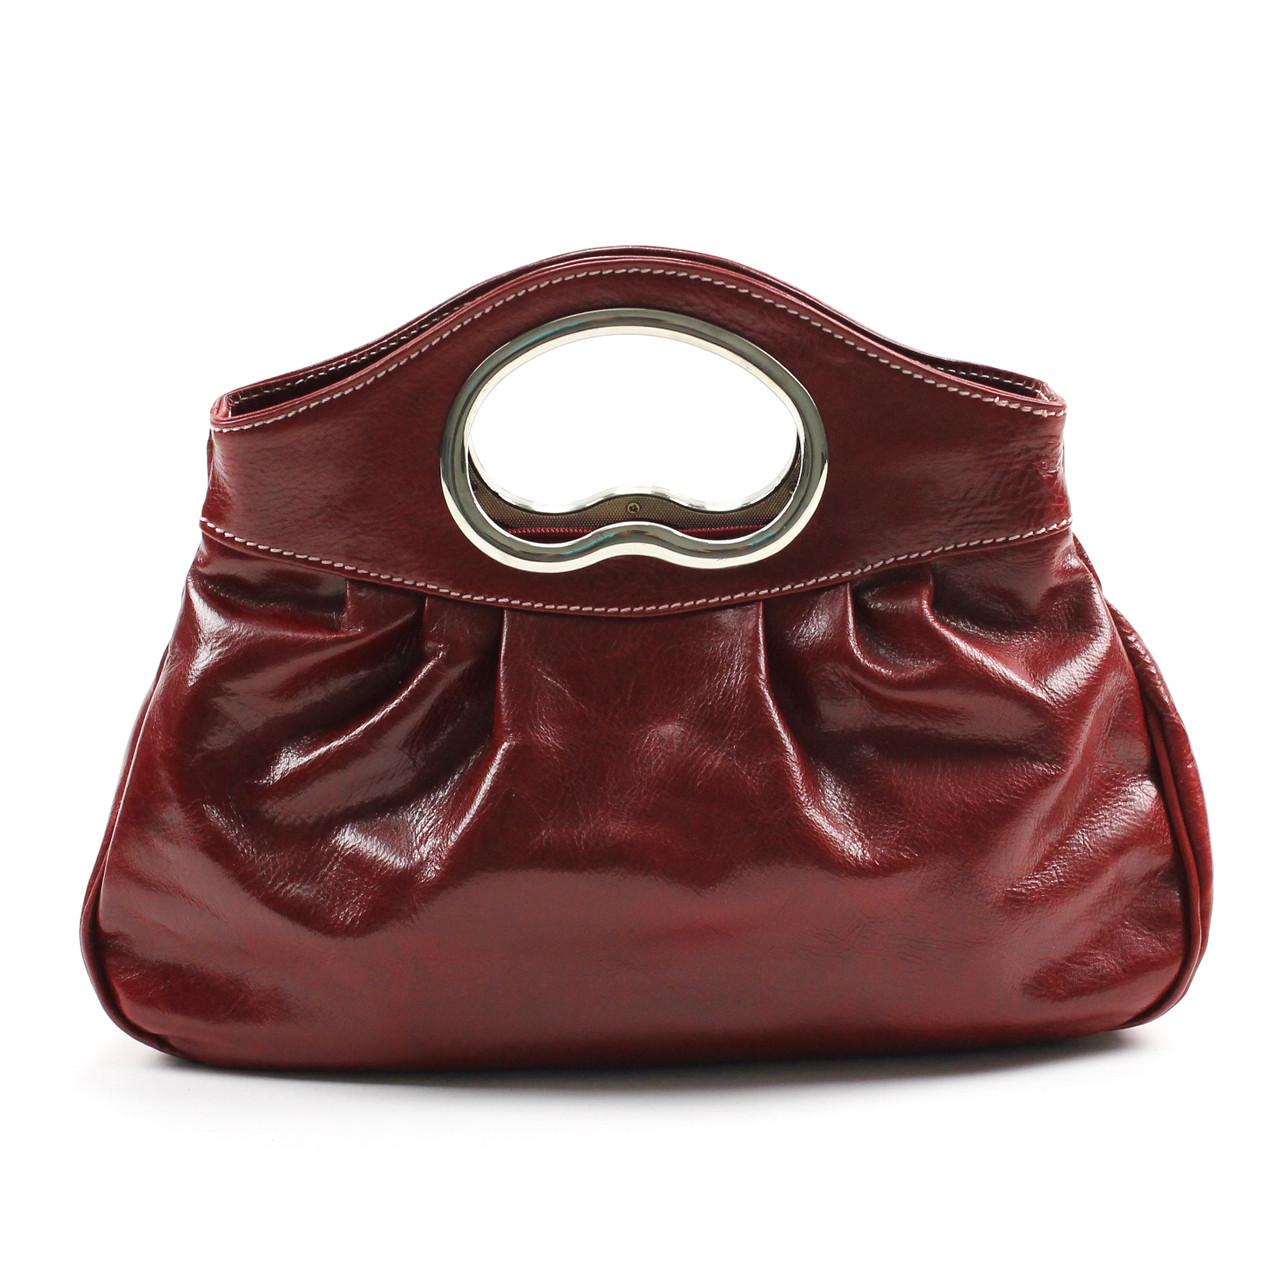 58c353e1be Nicole Italian Leather Handbag - Red